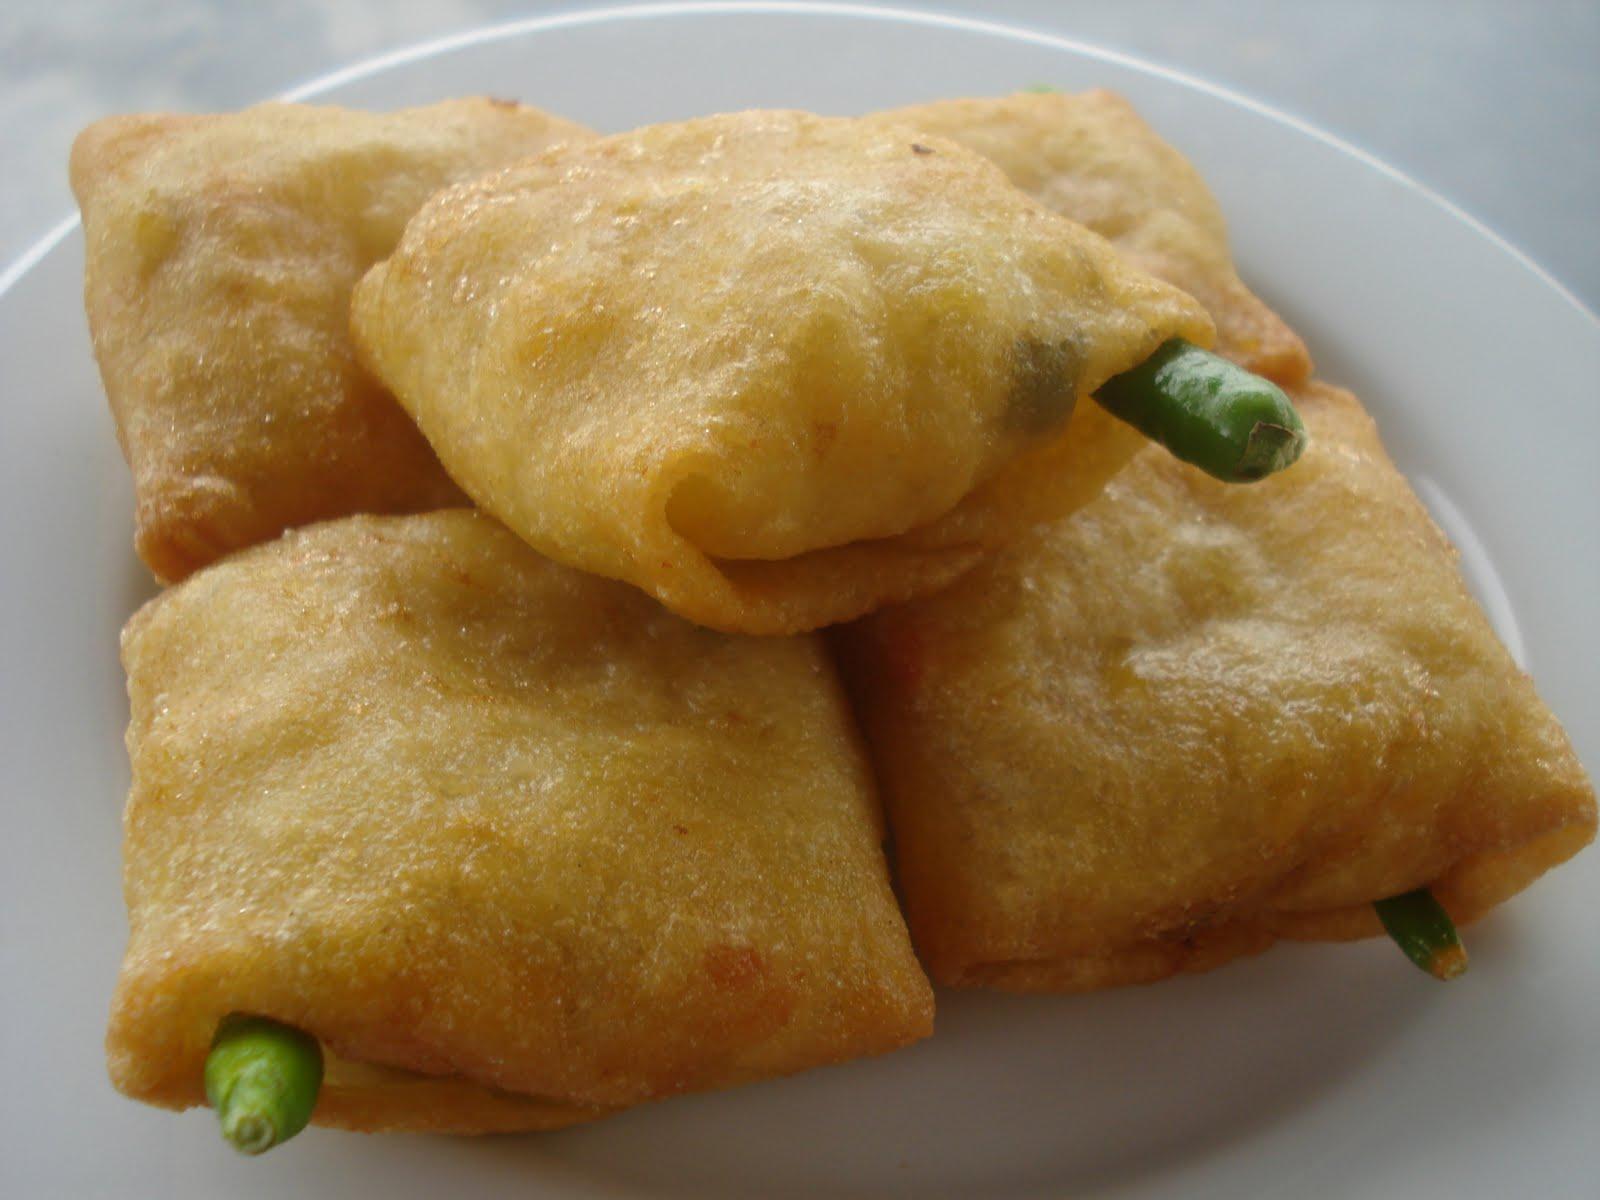 jasmin's kitchen: martabak mini